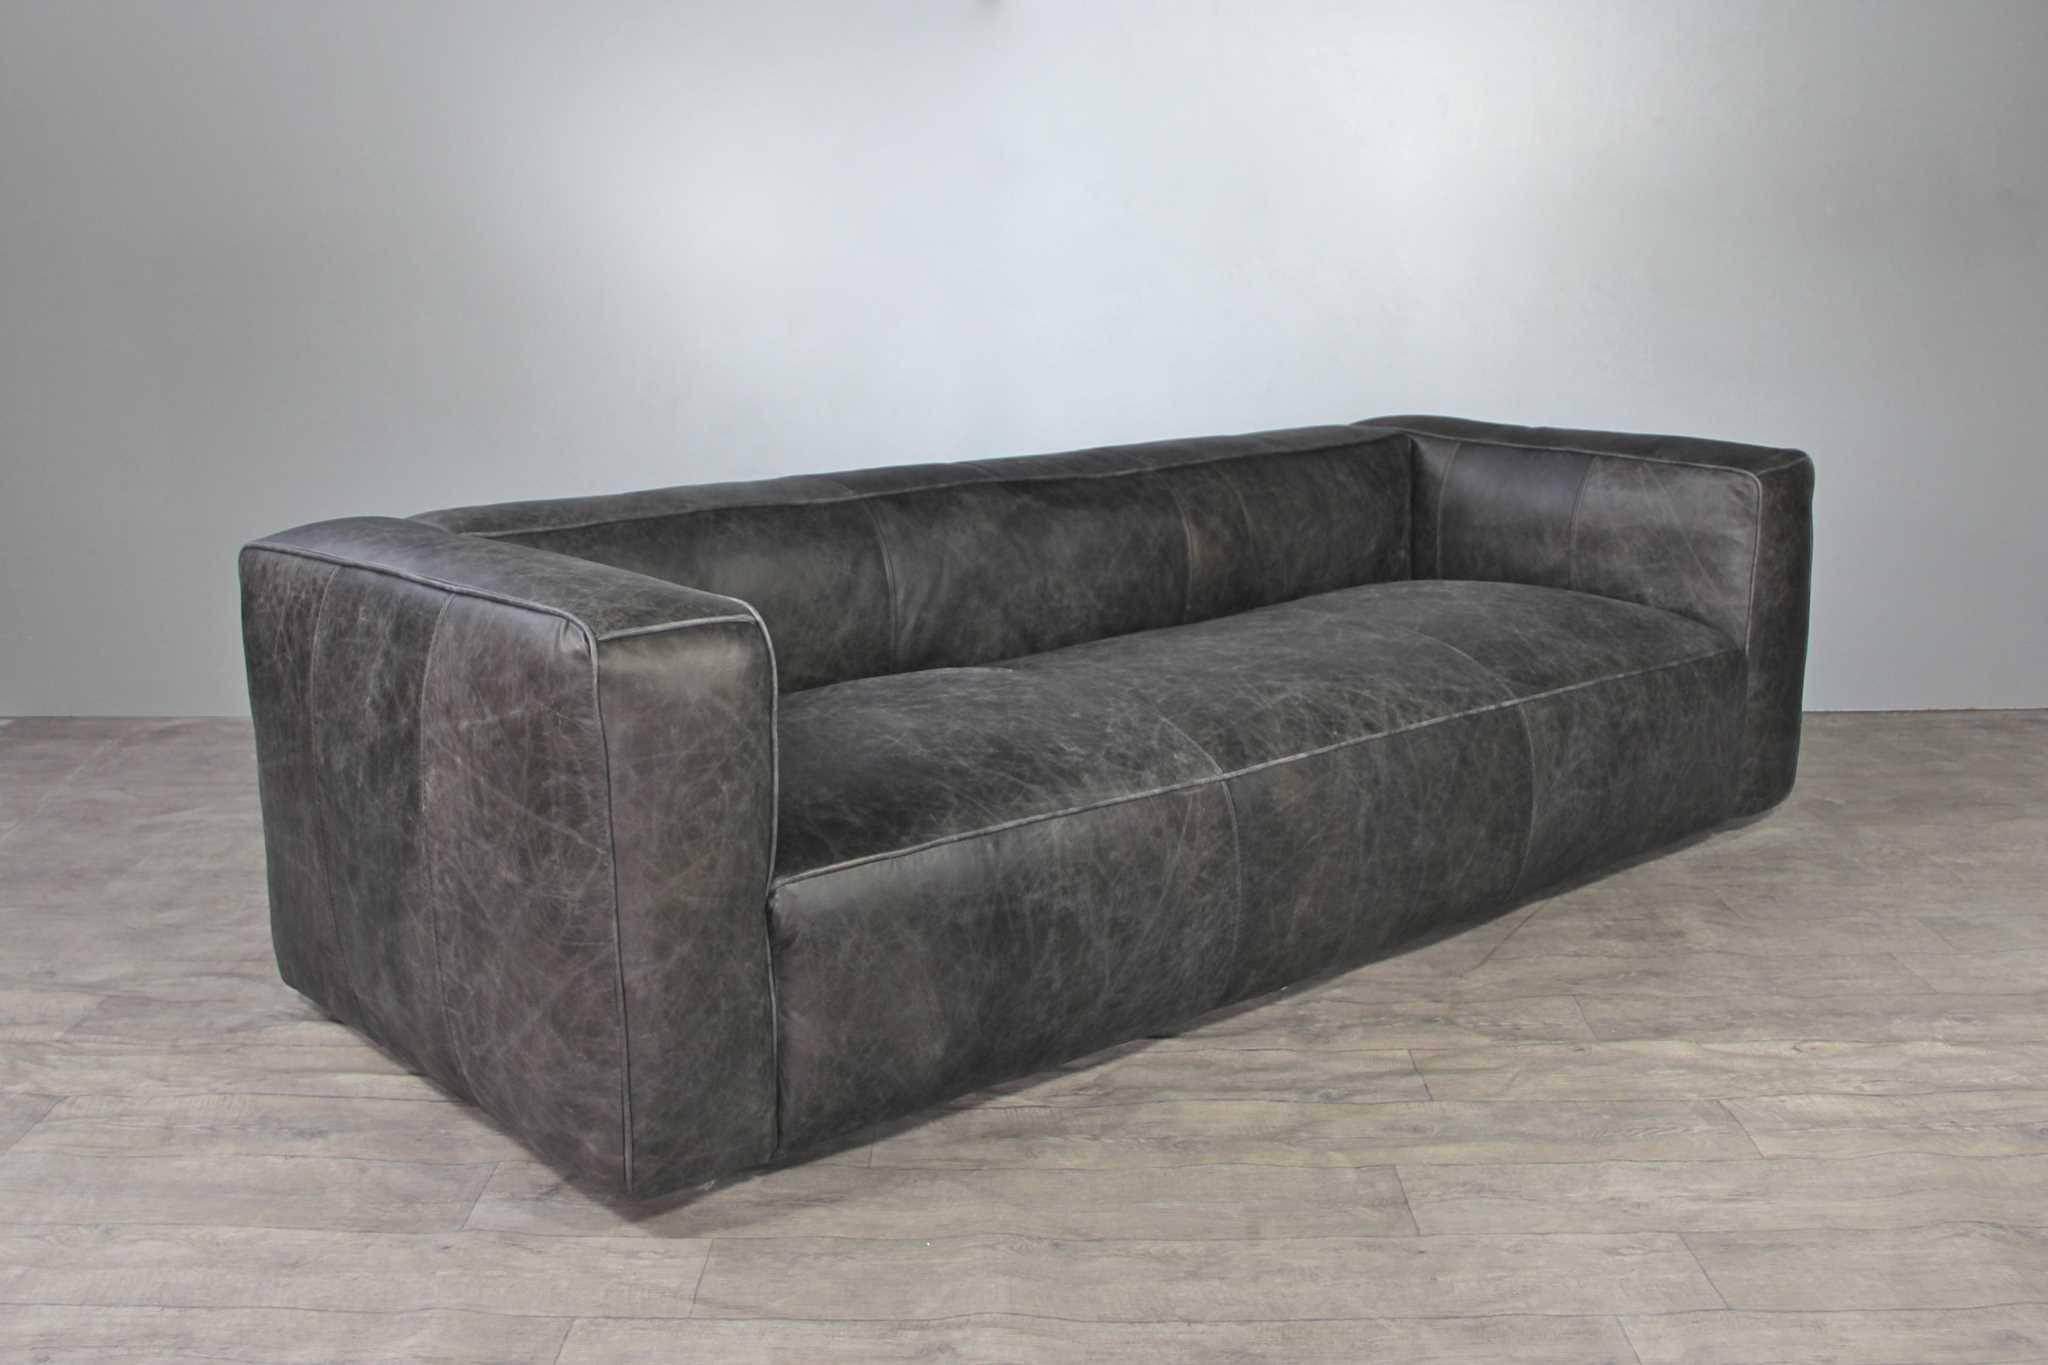 Canap chesterfield cuir fauteuil cuir sofas canap s d 39 angle - Canape chesterfield cuir ...